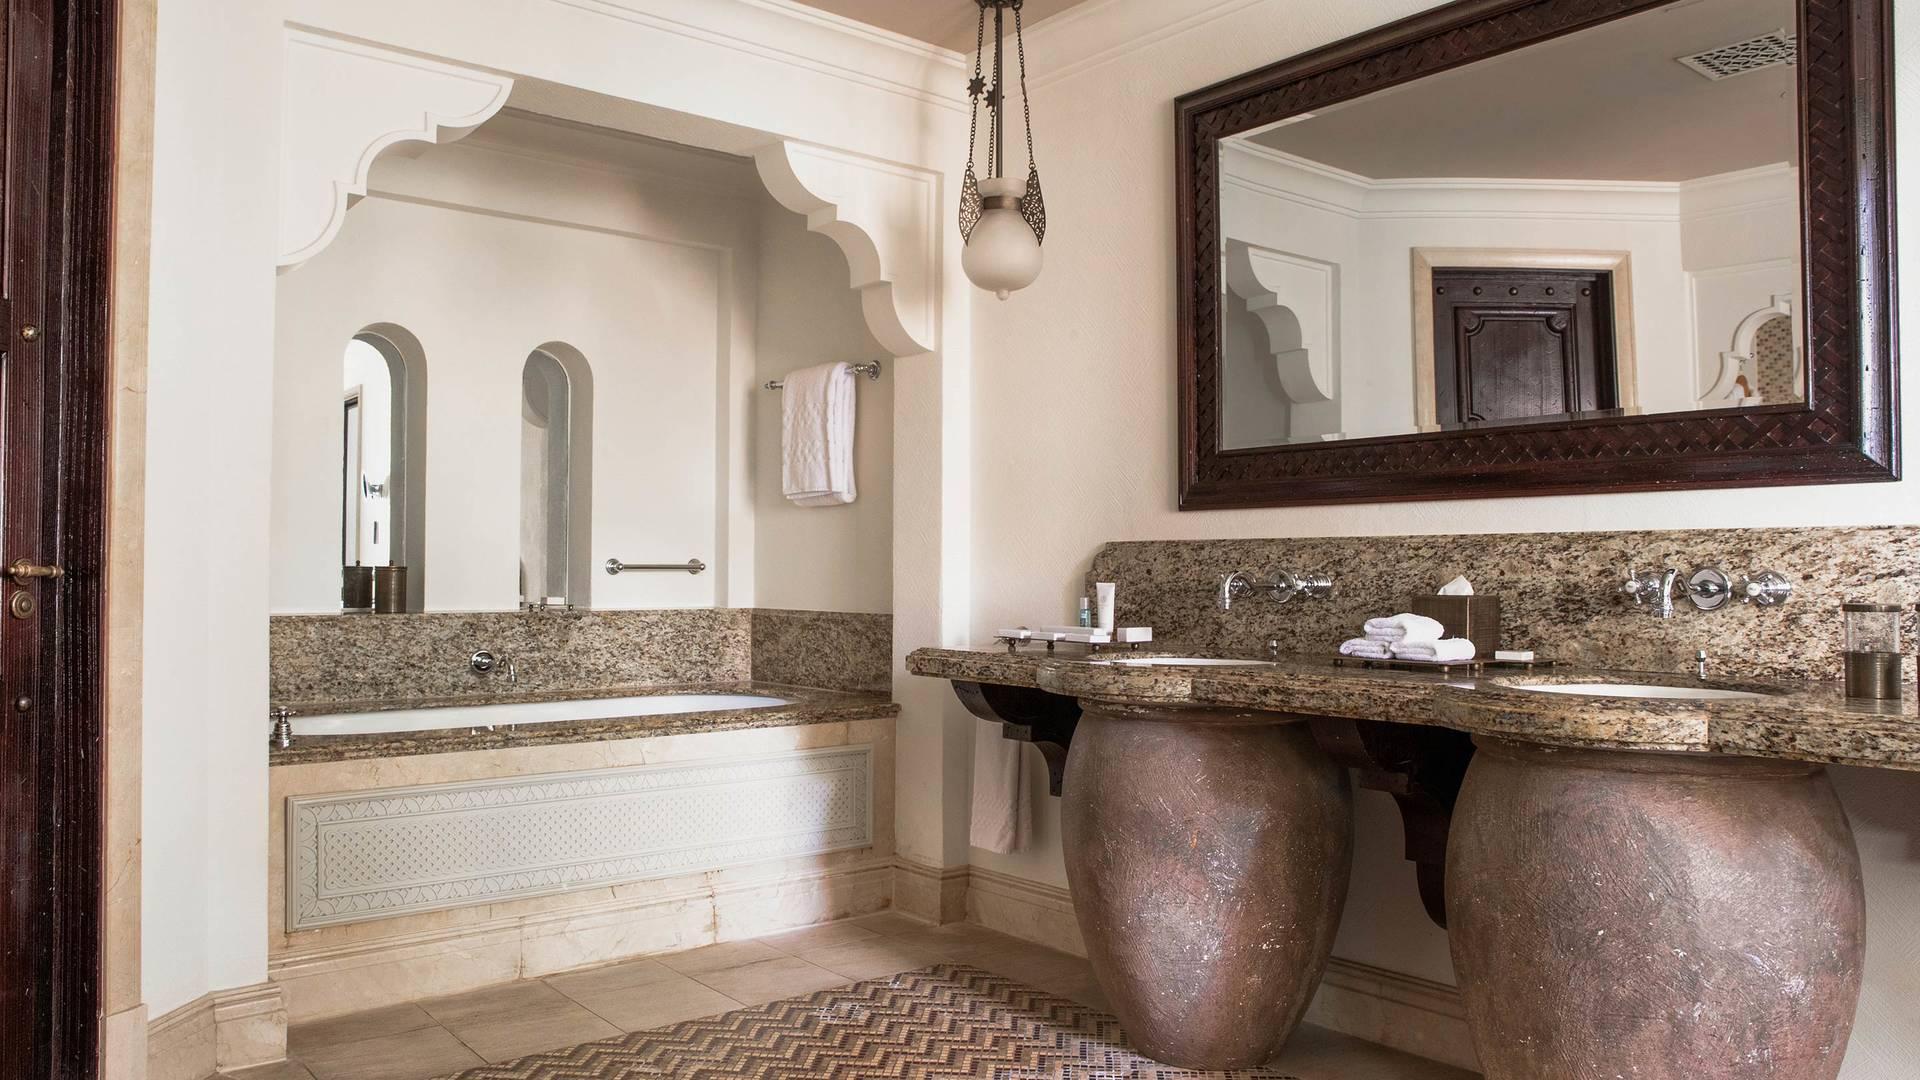 Jumeirah Dar Al Masyaf arabian summerhouse deluxe bathroom_16-9